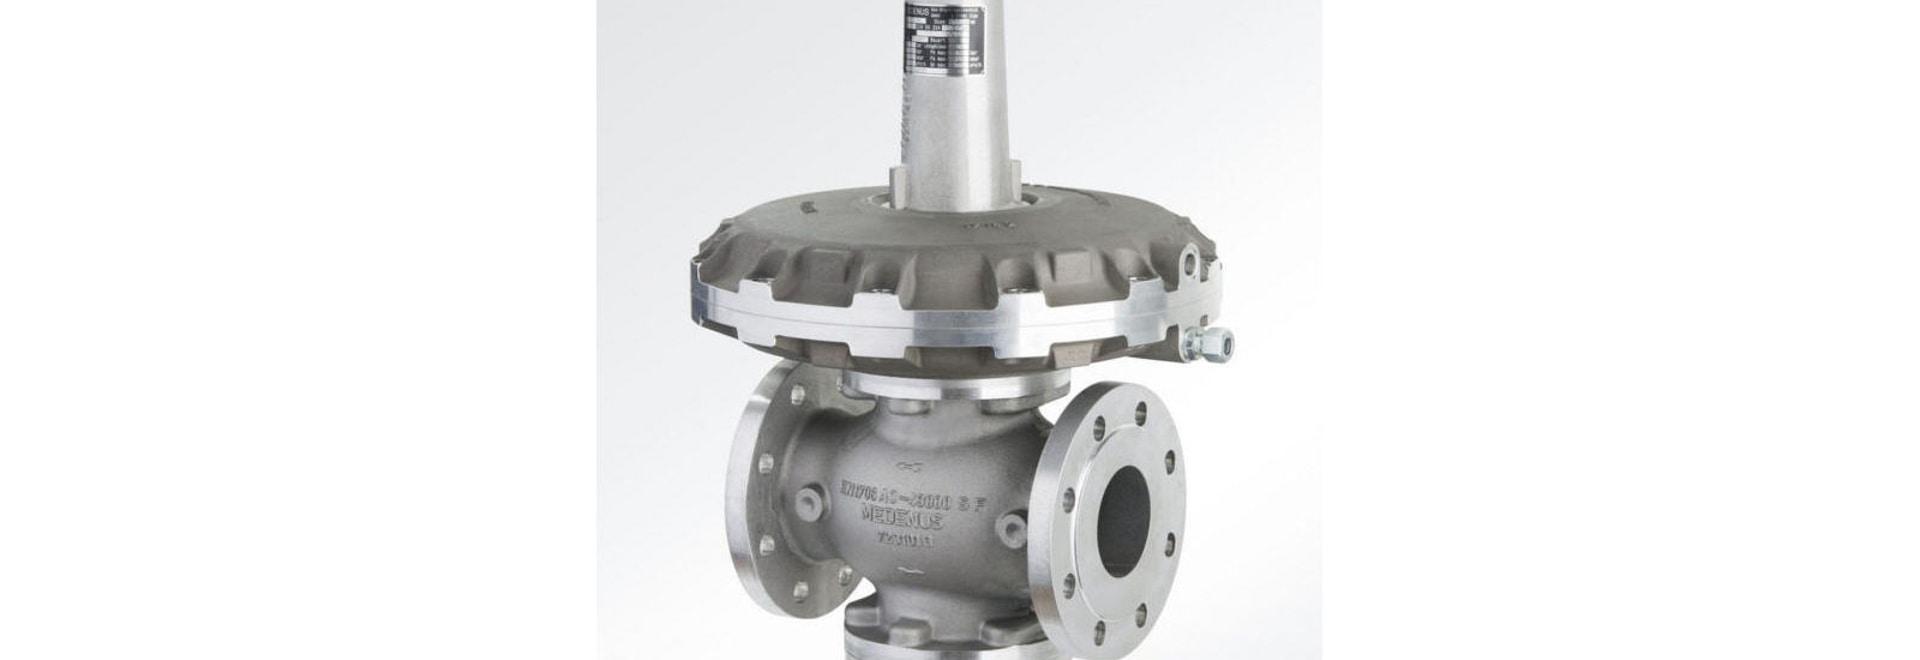 Gas pressure regulator series R100/R101